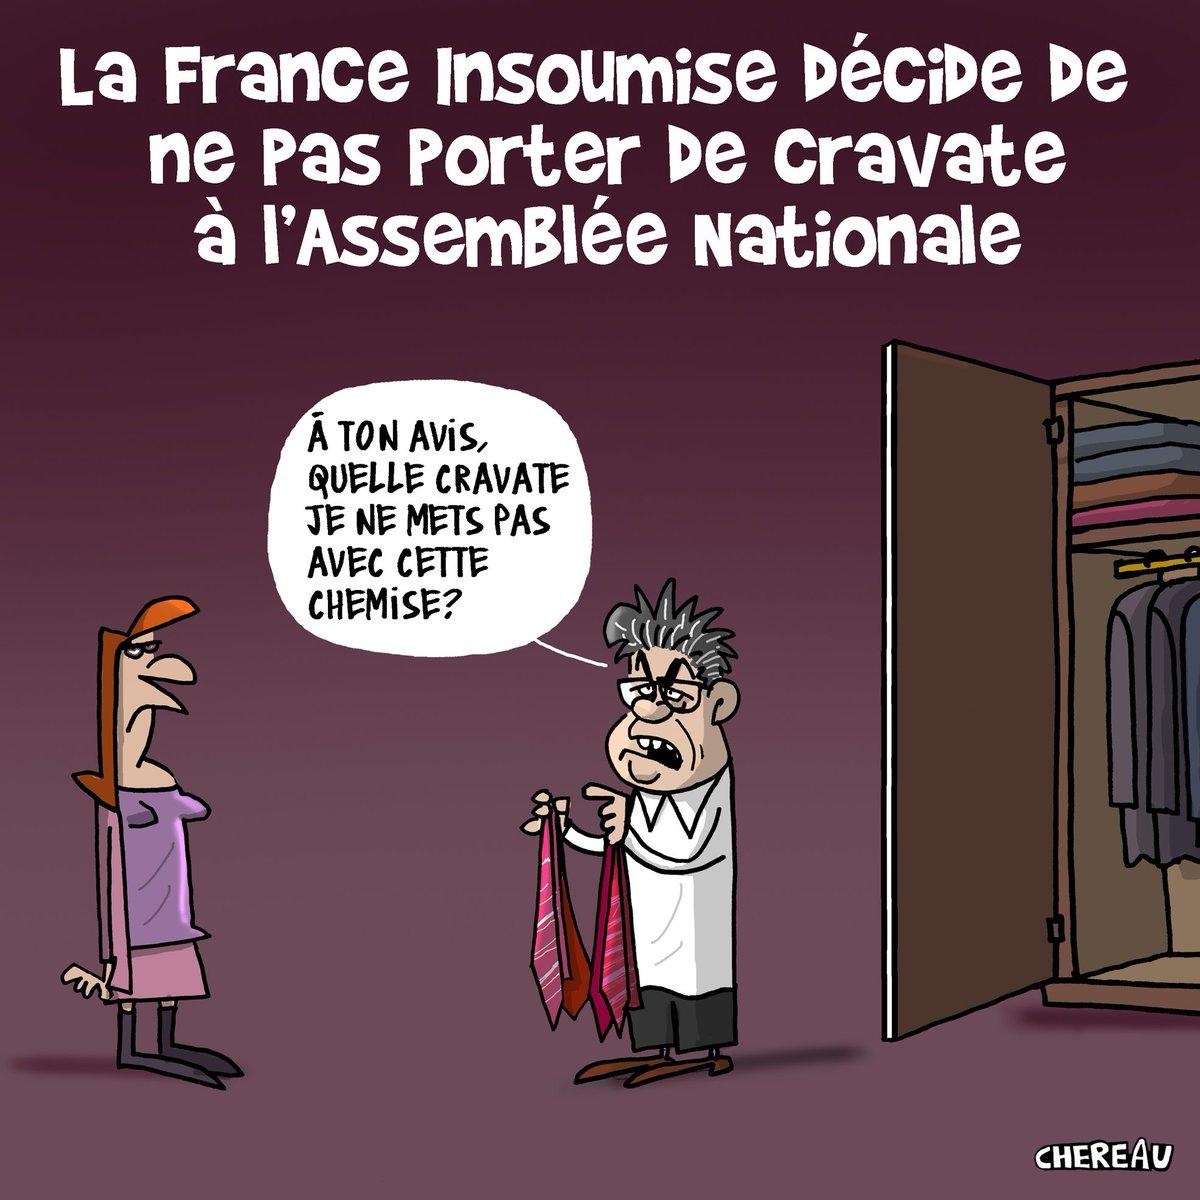 Antoine Chereau Cartoonist On Twitter Souvenir Poignant